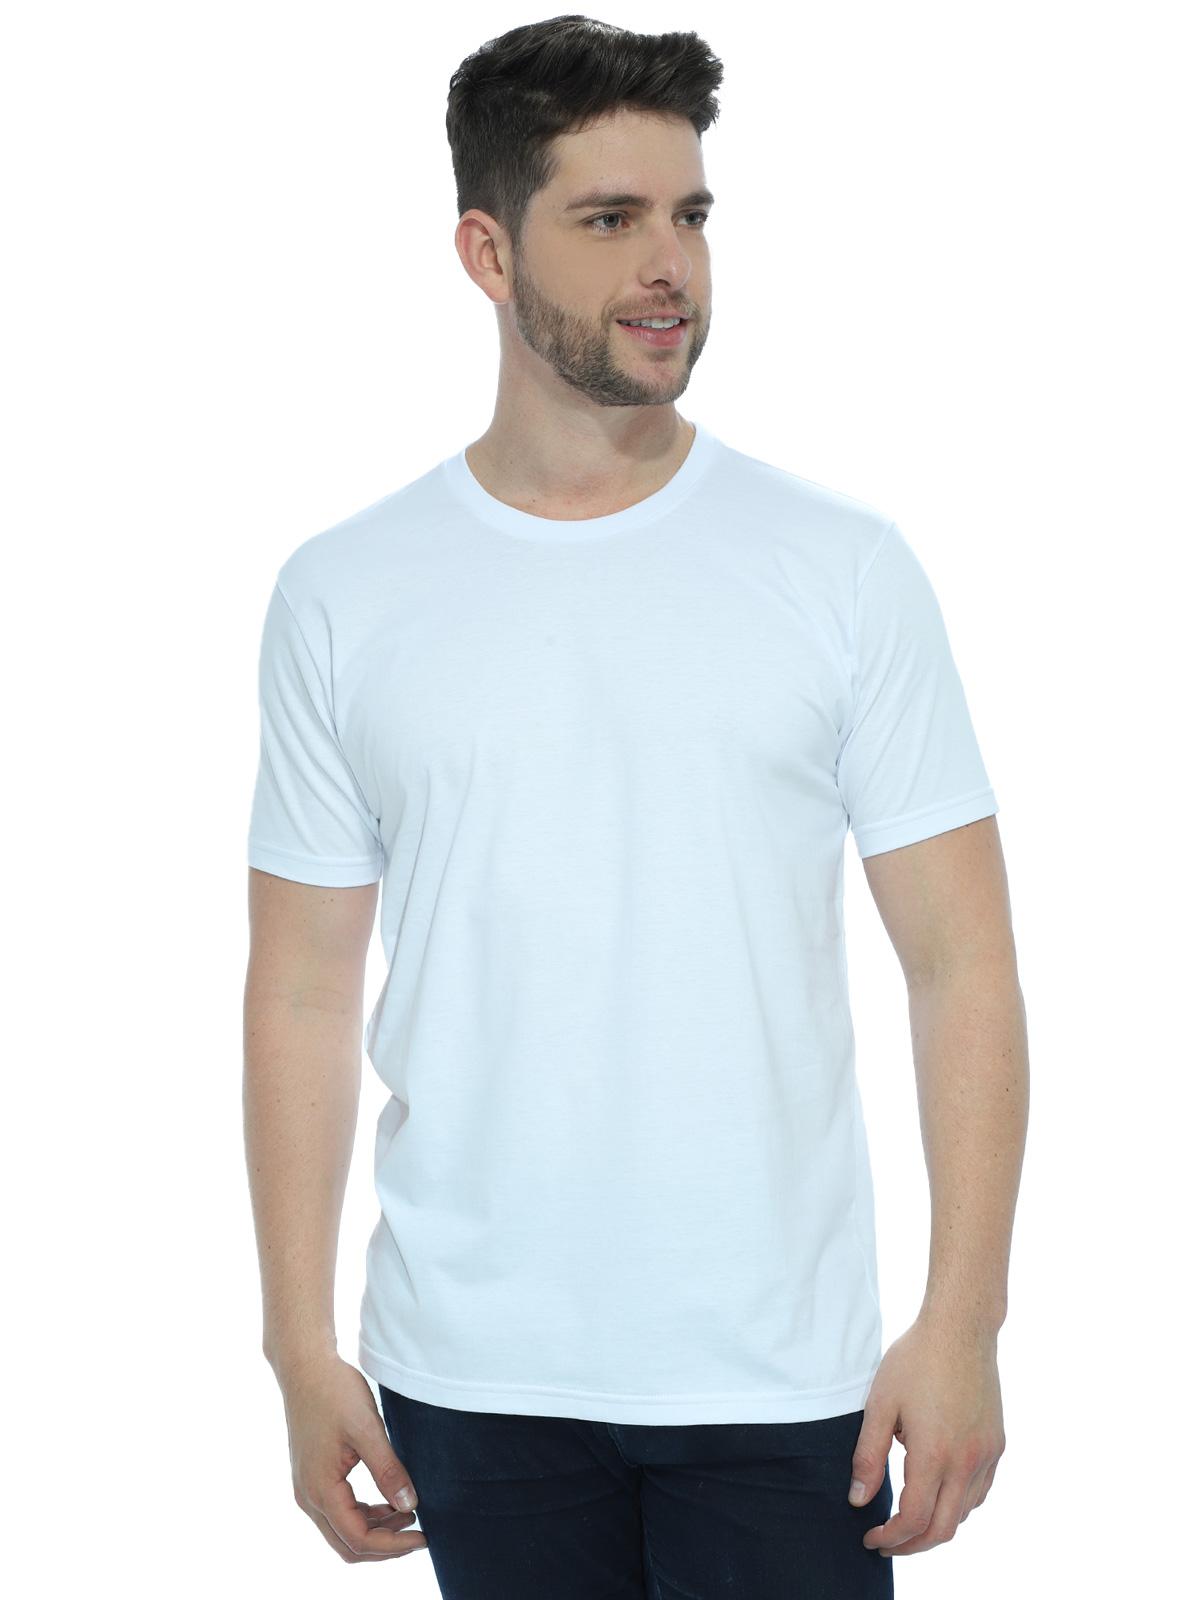 Camiseta Masculina Algodão Manga Curta Básica Lisa Branco